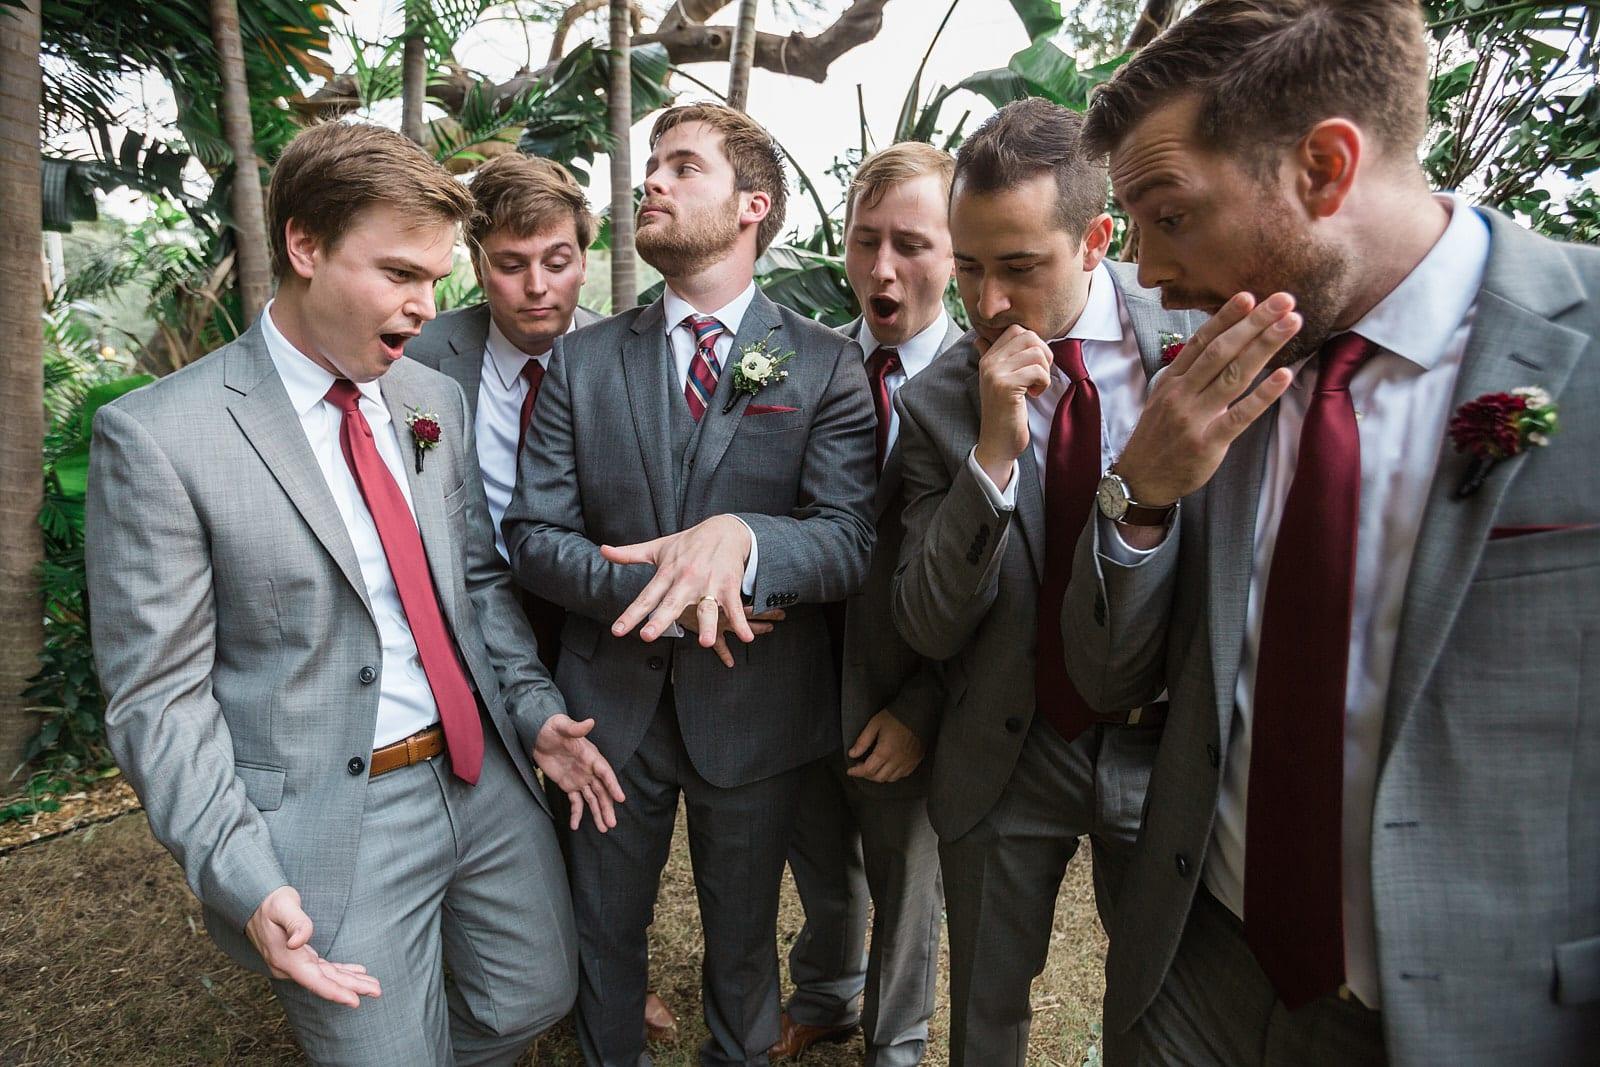 groom shows off wedding ring to groomsmen